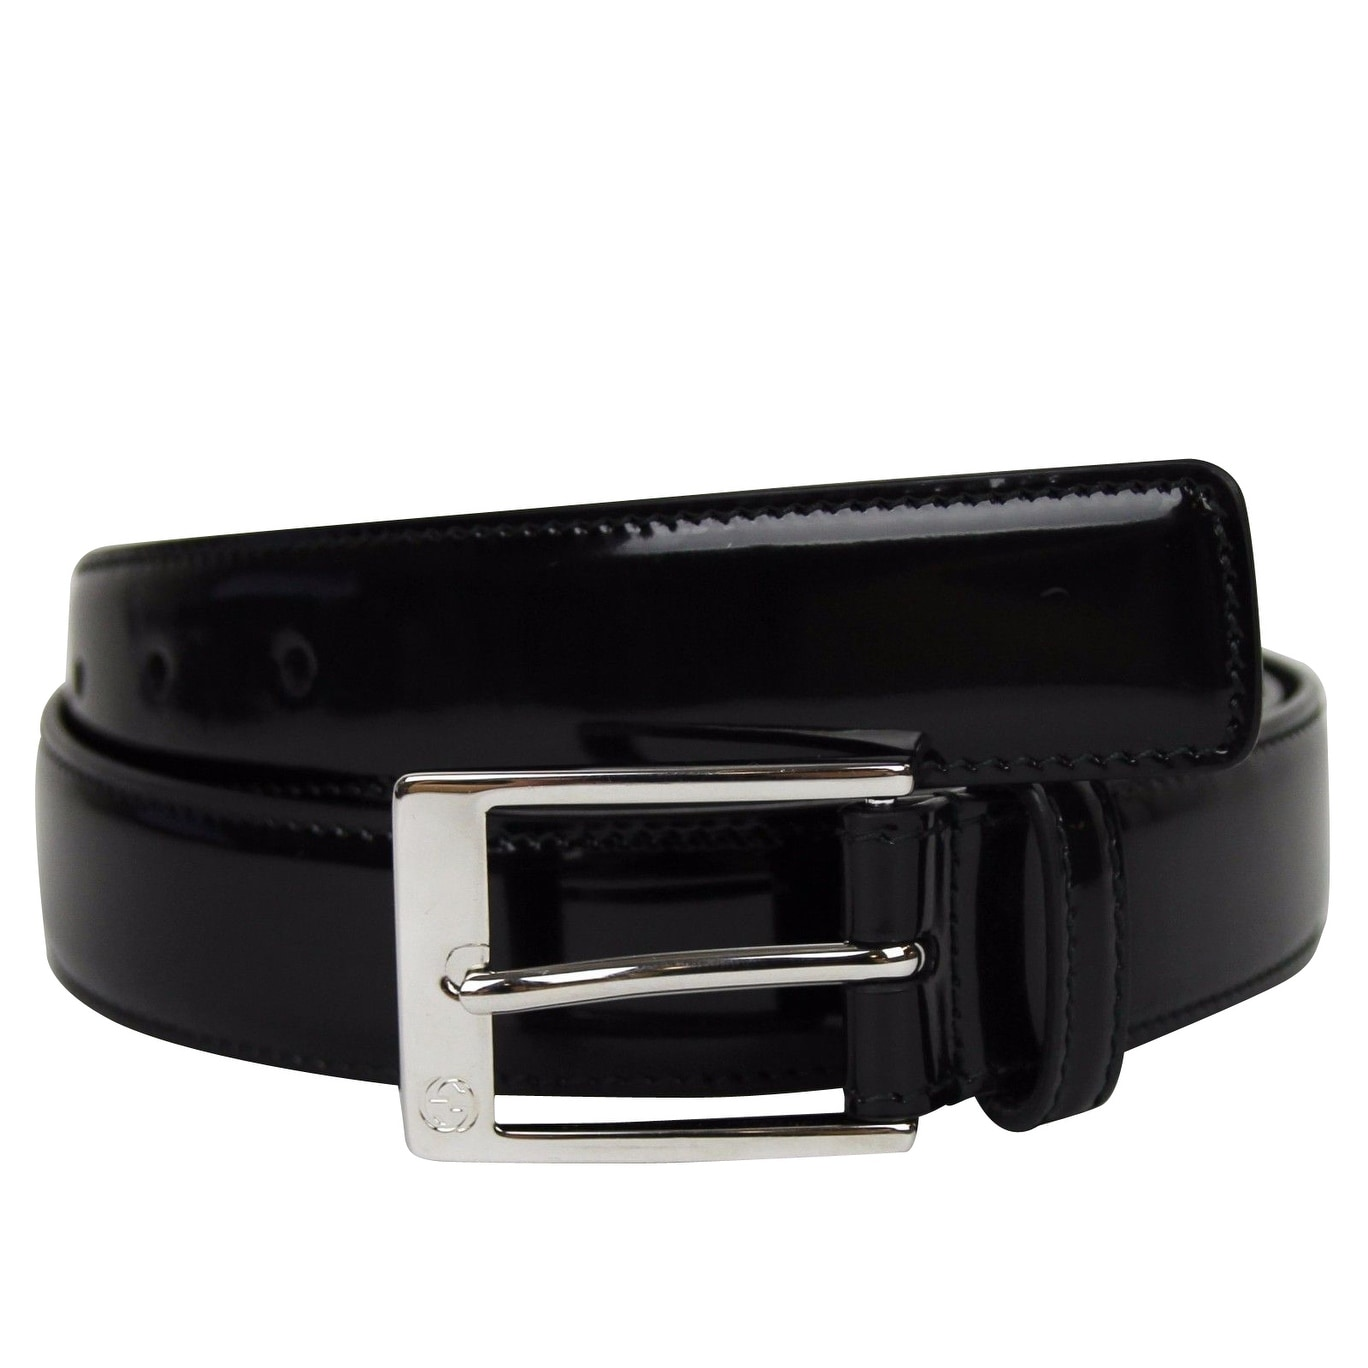 0fe5168a64306a Buy Gucci Men's Belts Online at Overstock   Our Best Belts Deals